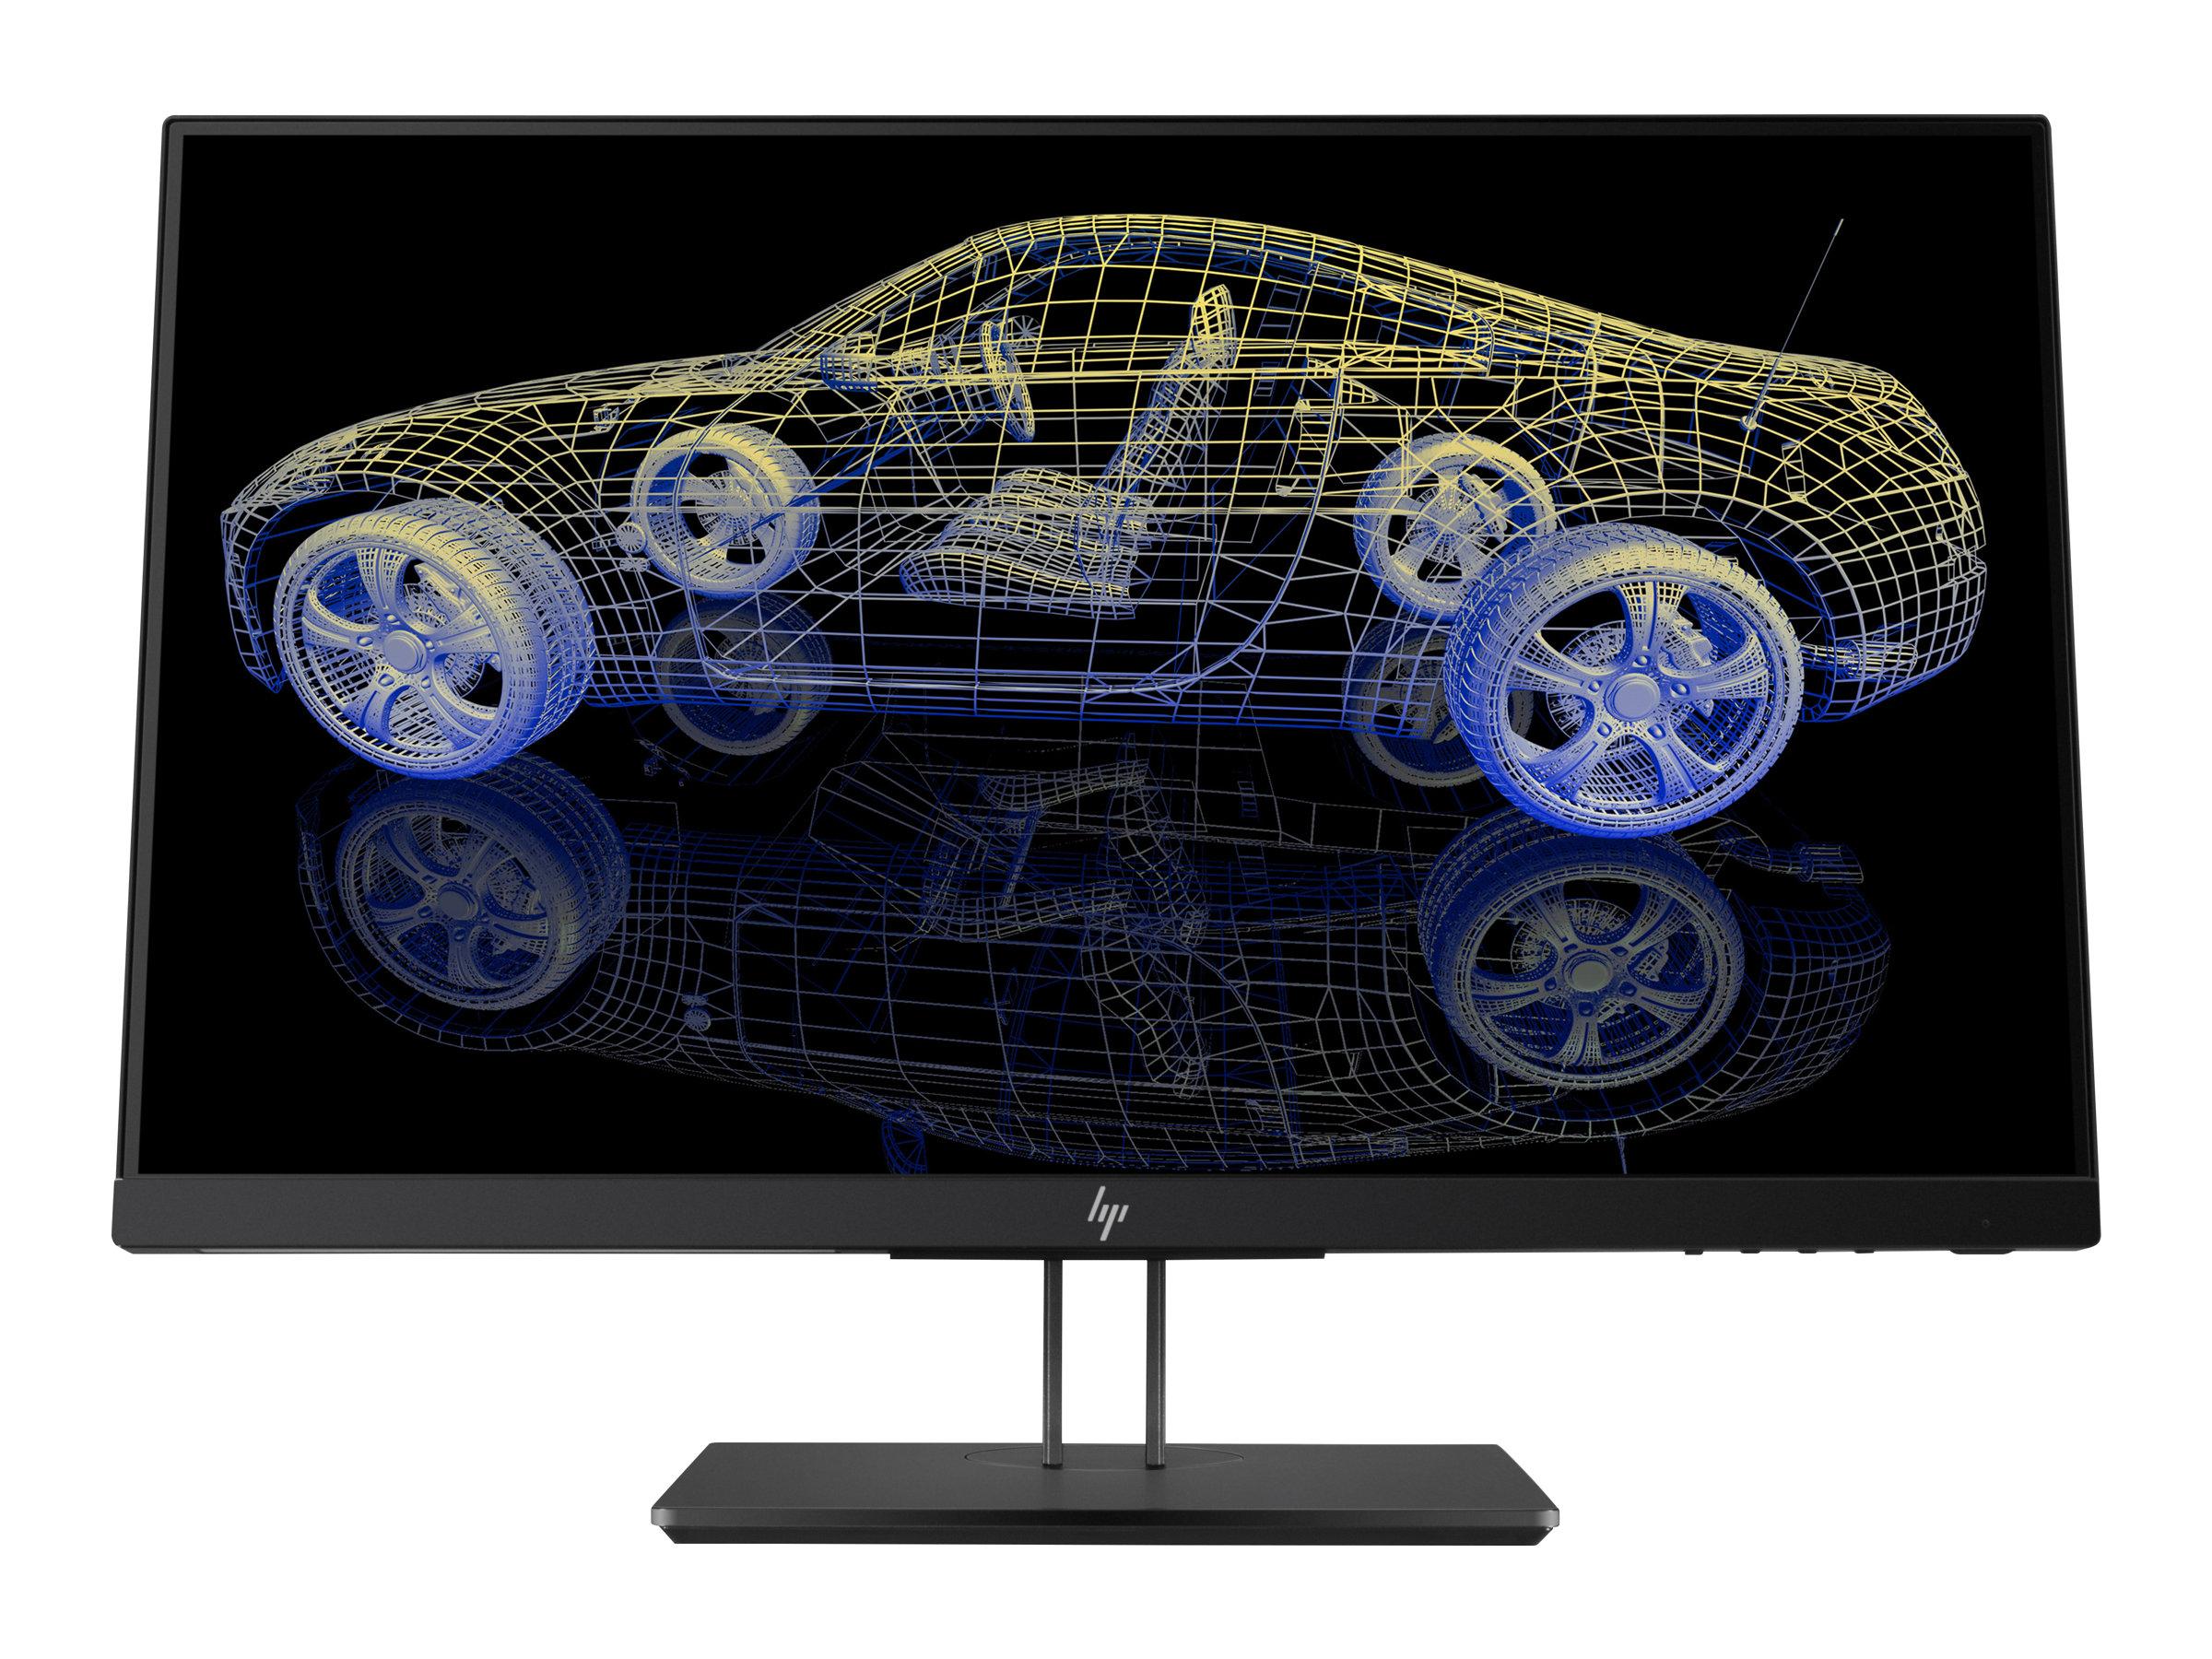 HP Z23n G2 - LED-Monitor - 58.42 cm (23